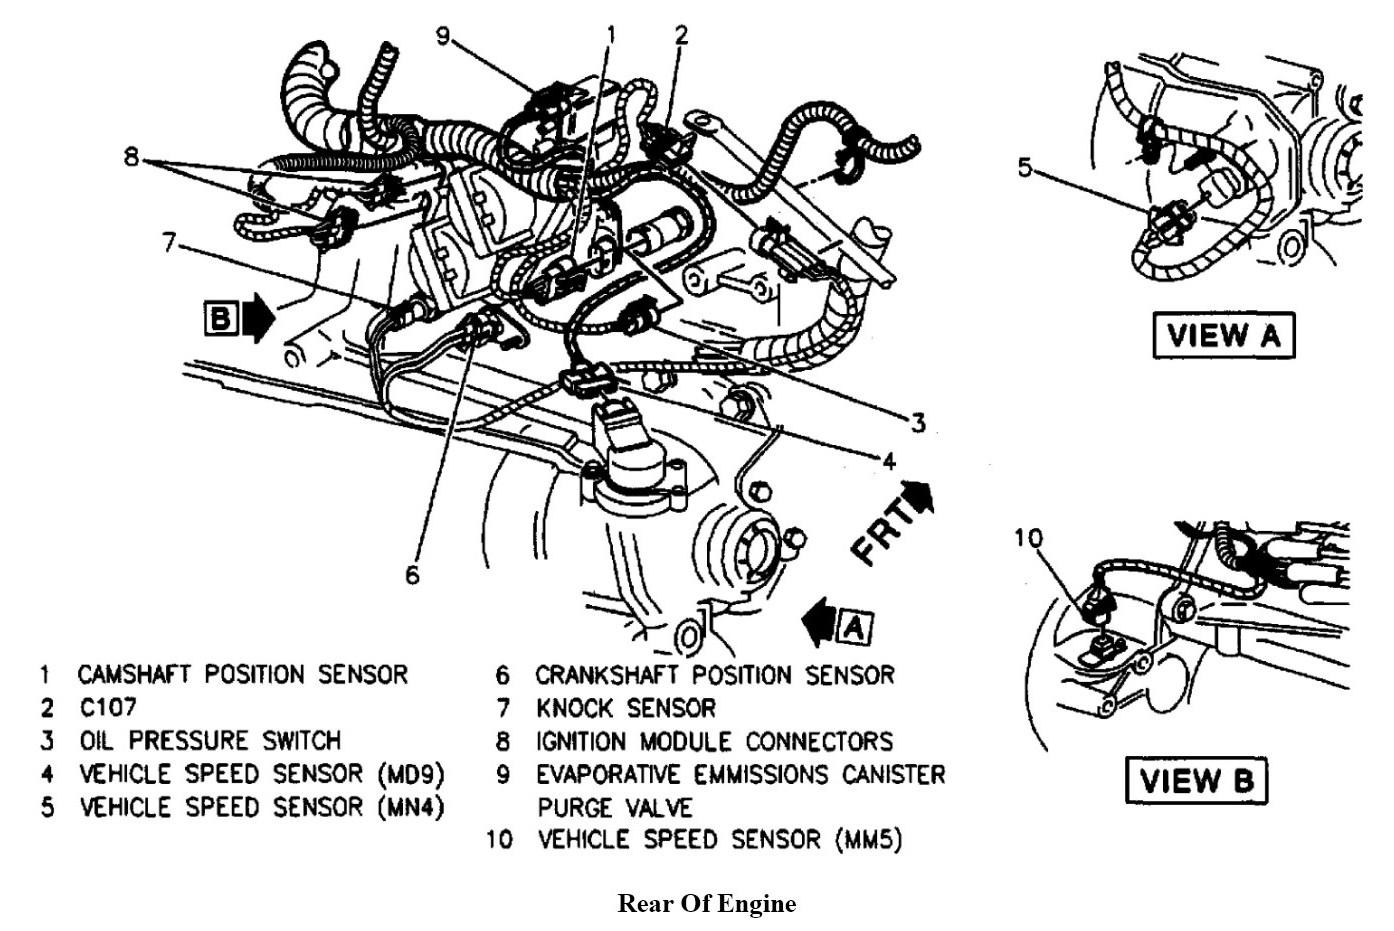 GR_9710] Chevrolet 2 2L Engine Diagram Get Free Image About Wiring Diagram  Download DiagramSieg Alia Mepta Spoat Mopar Bdel Elae Animo Bemua Mohammedshrine Librar  Wiring 101